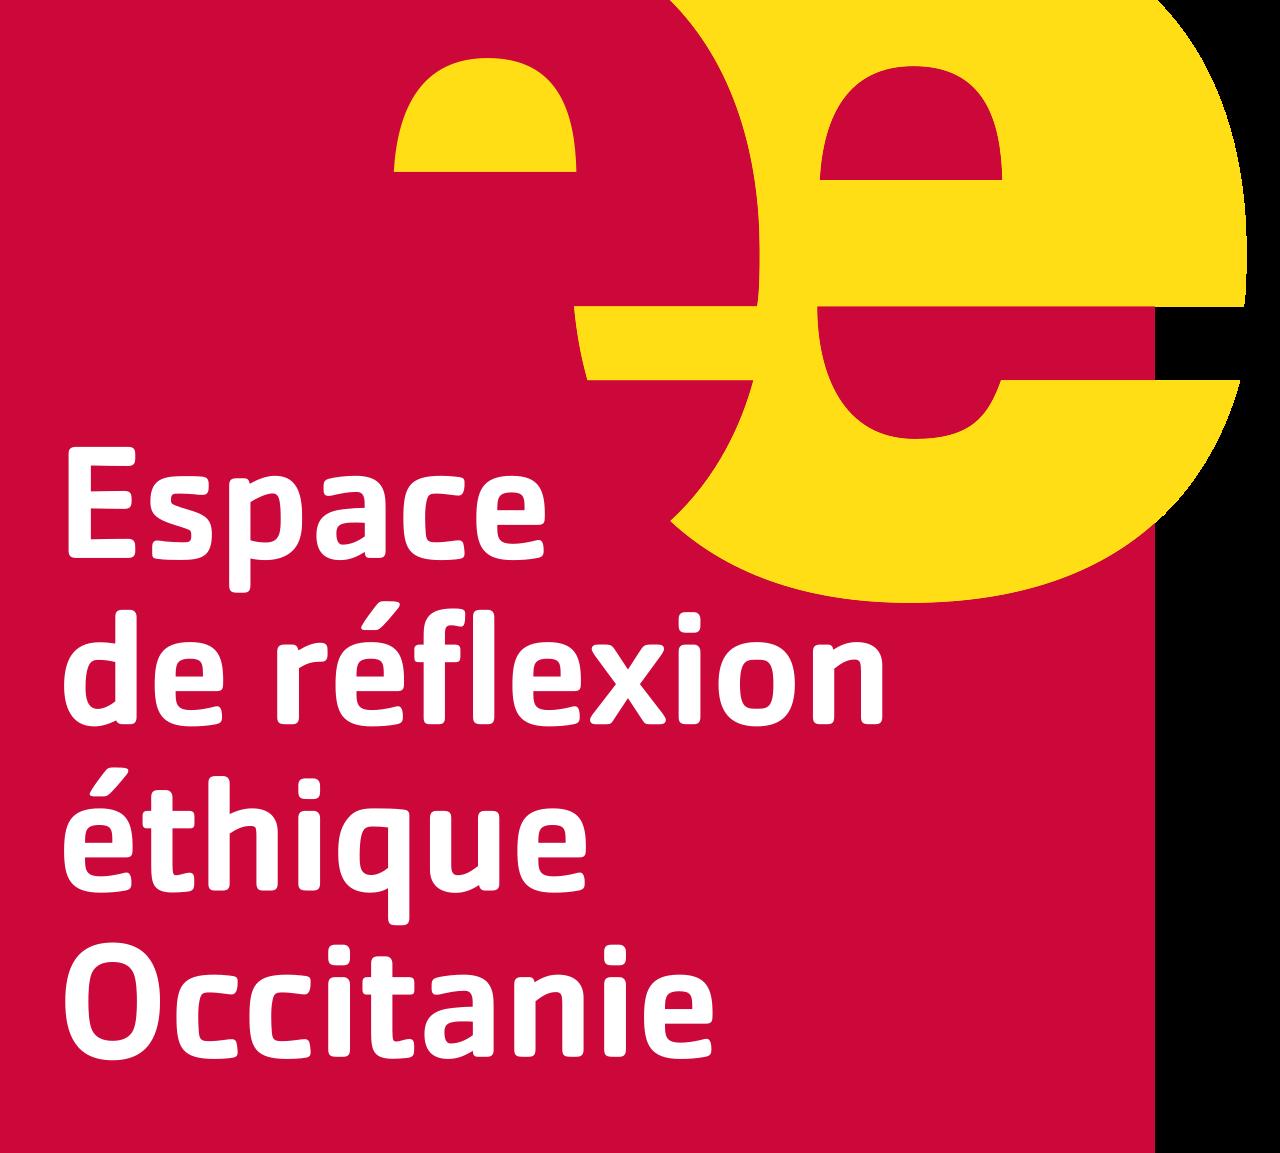 ERE Occitanie